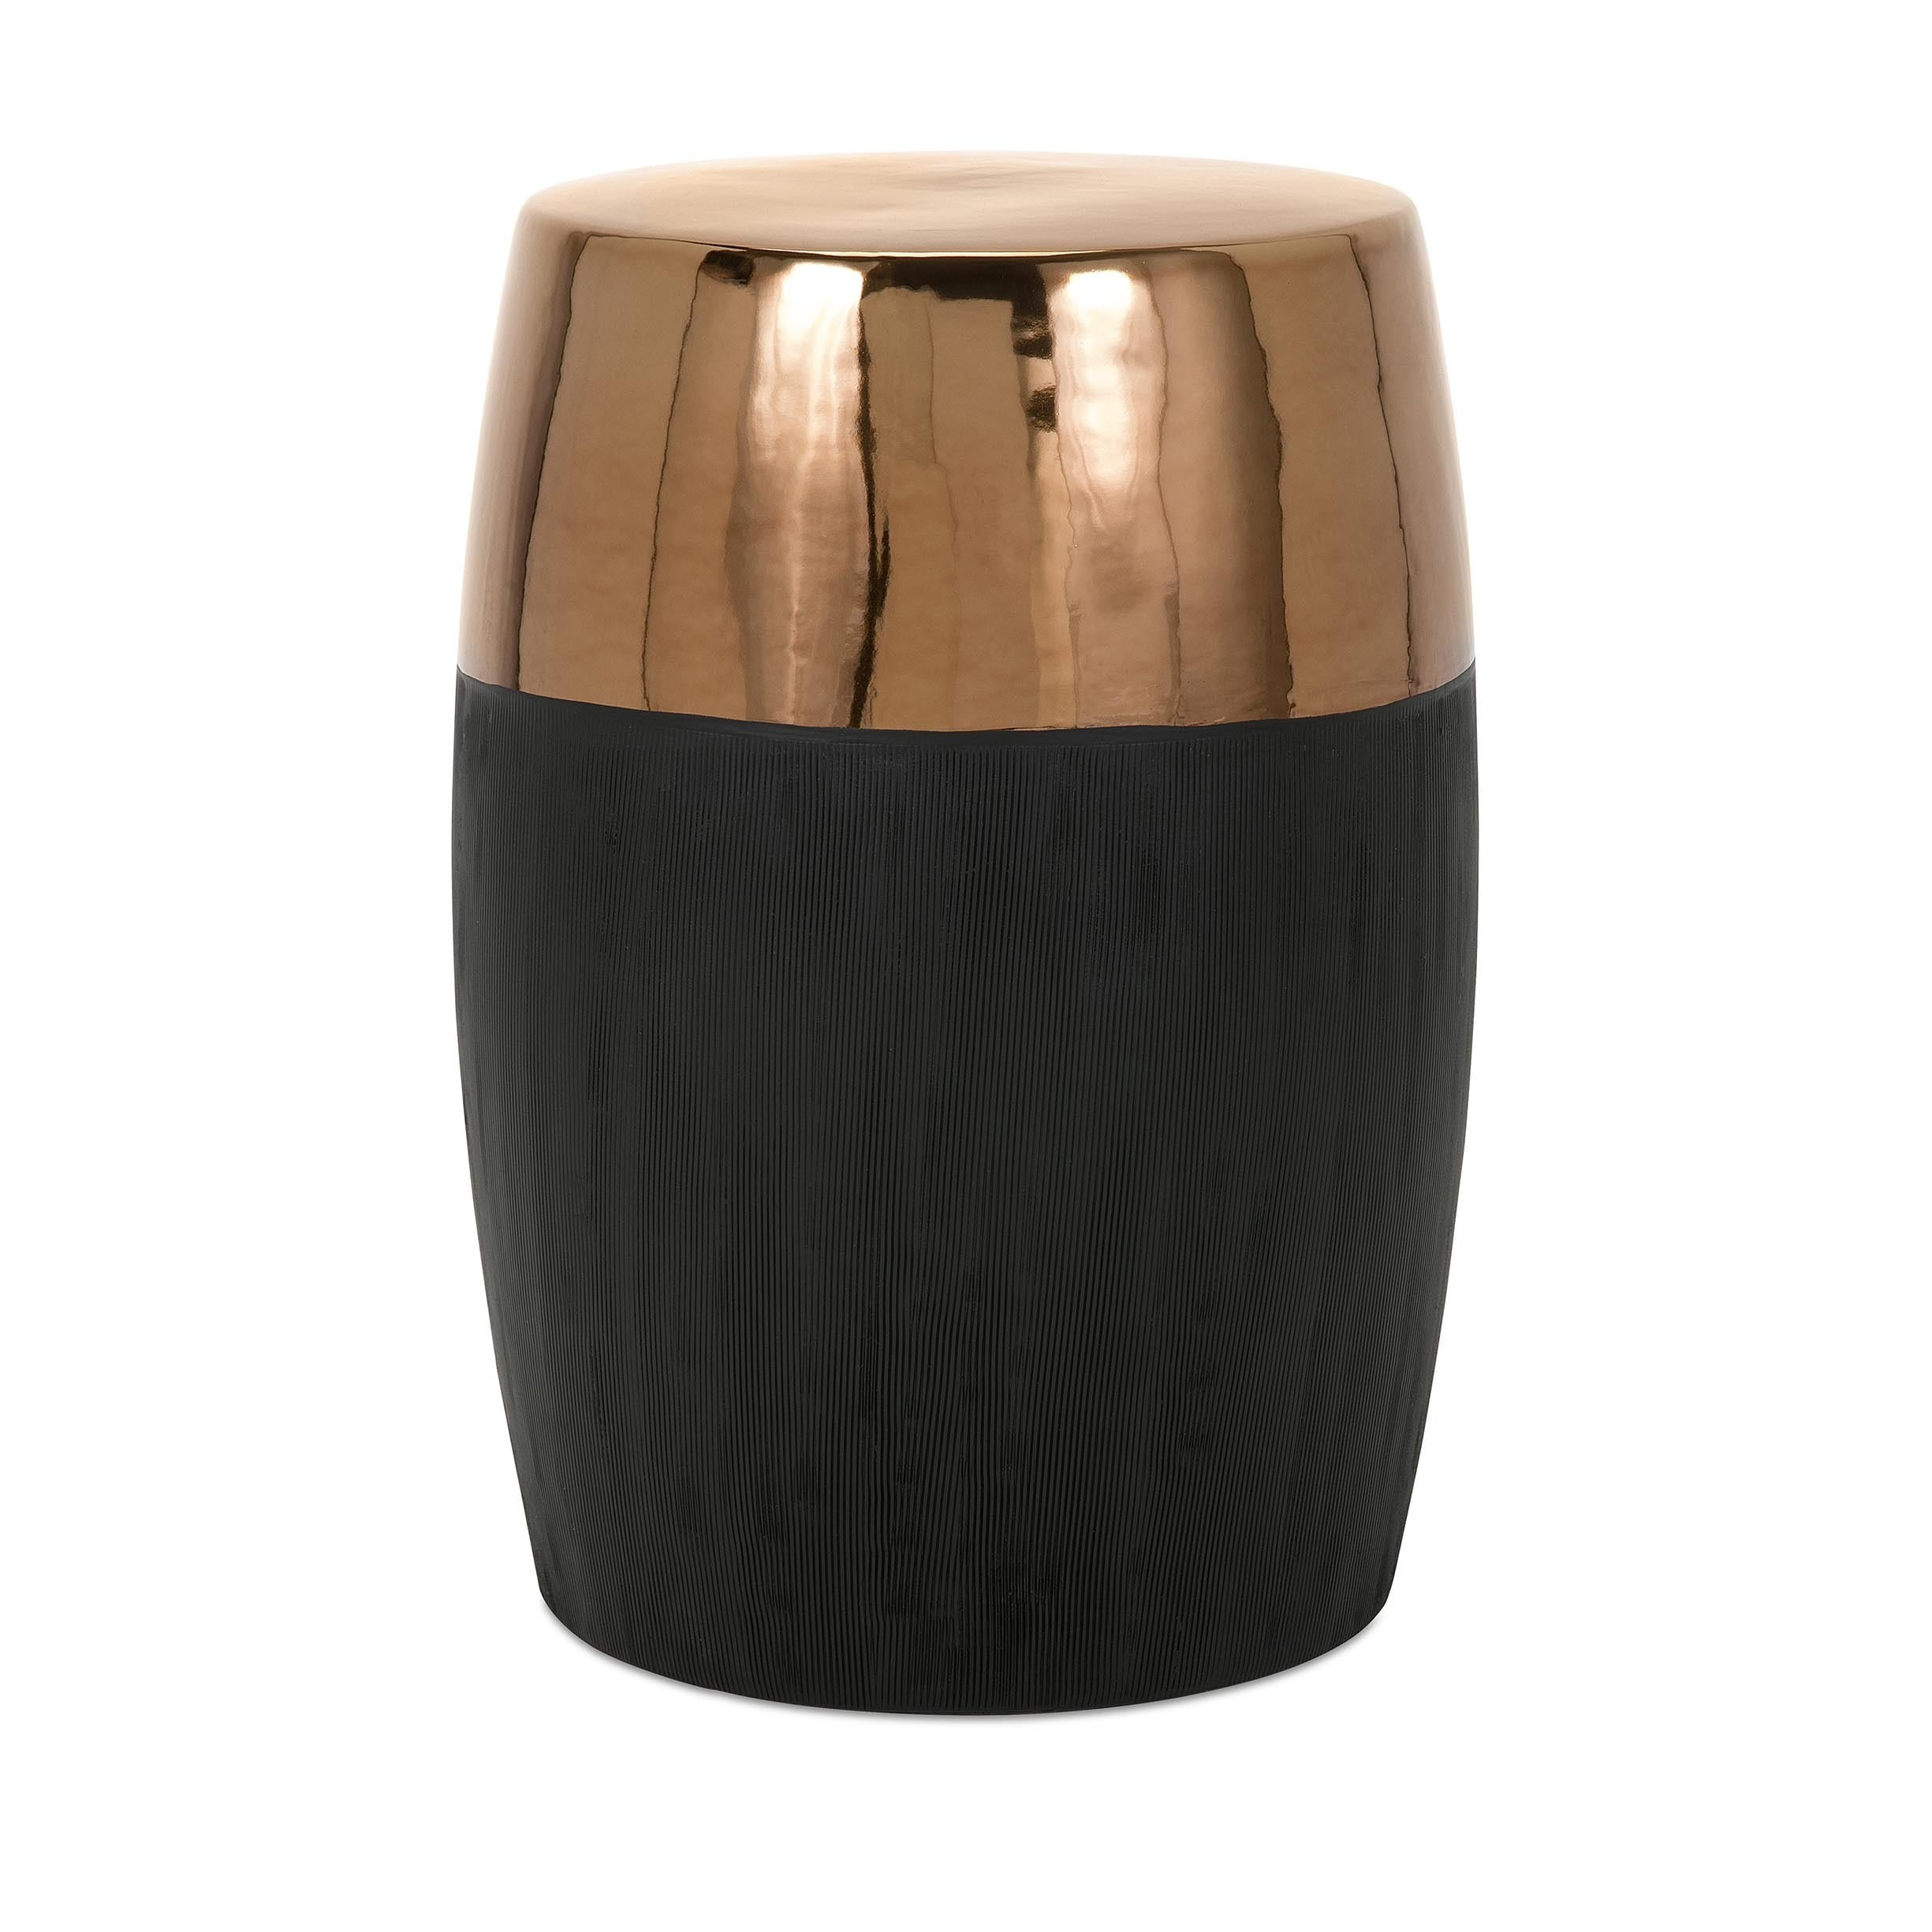 IMAX Rhone Garden Stool (Stool), Black (Ceramic, Solid)